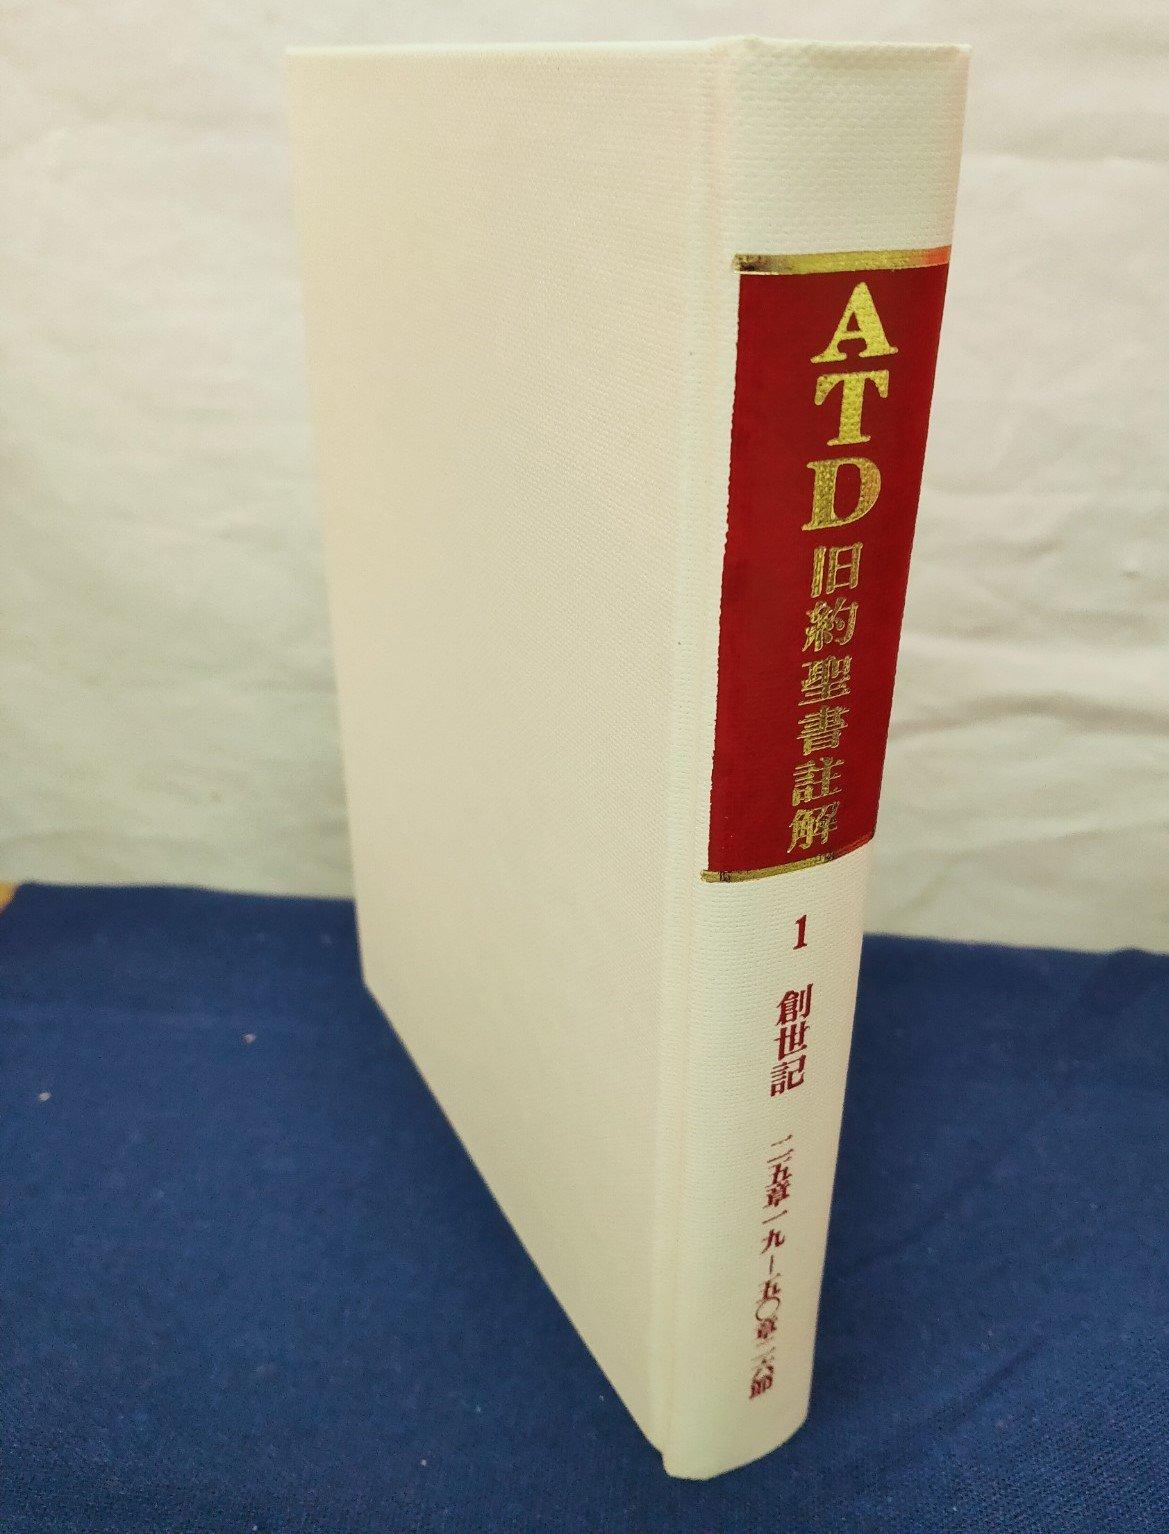 ATD旧約聖書註解1/2 創世記2 25章19節〜50章26節の商品画像